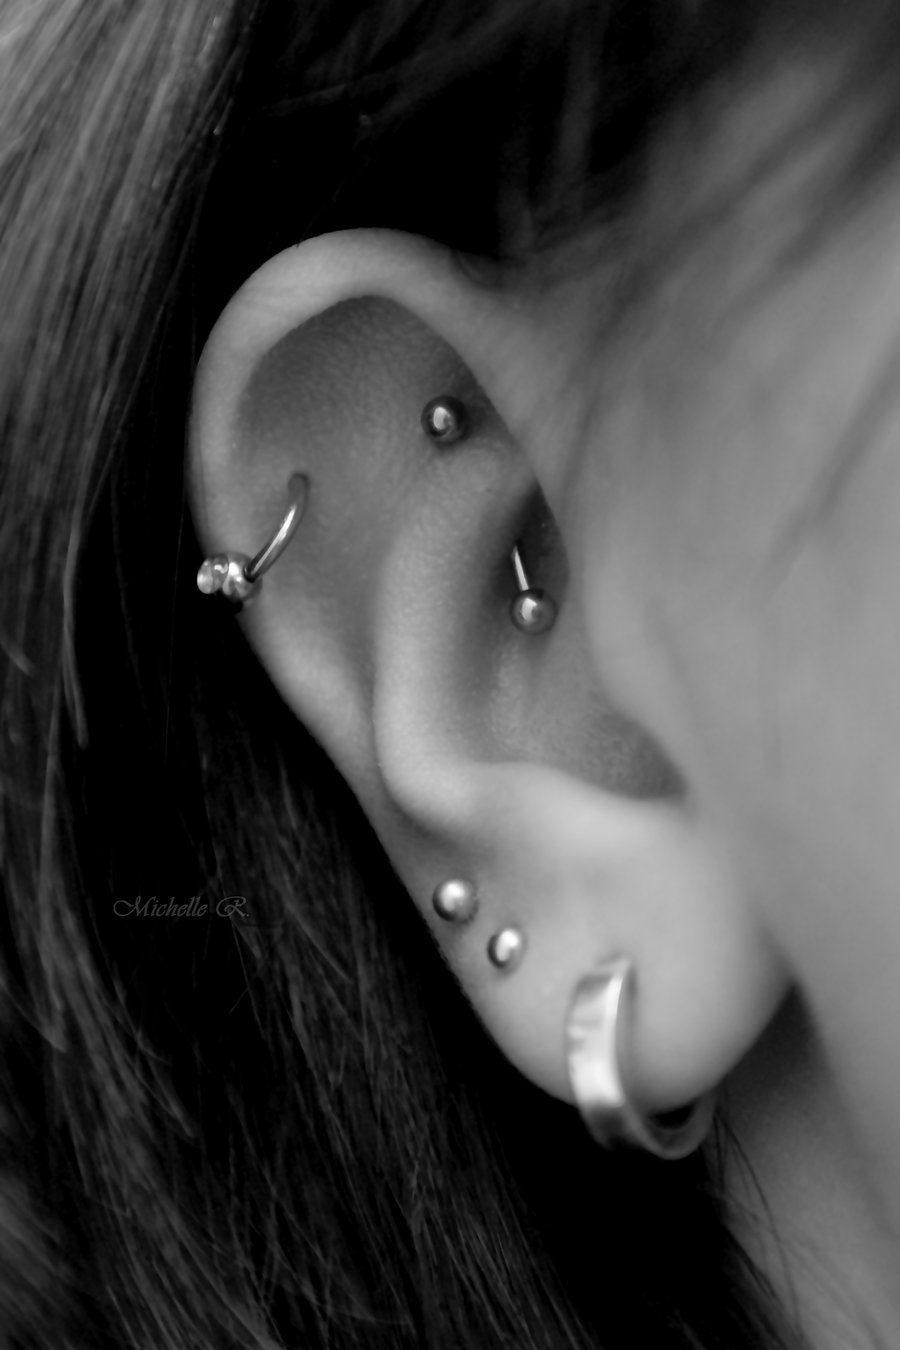 Snug piercing ideas  i really really really want a rook piercing  Tattoos  Pinterest